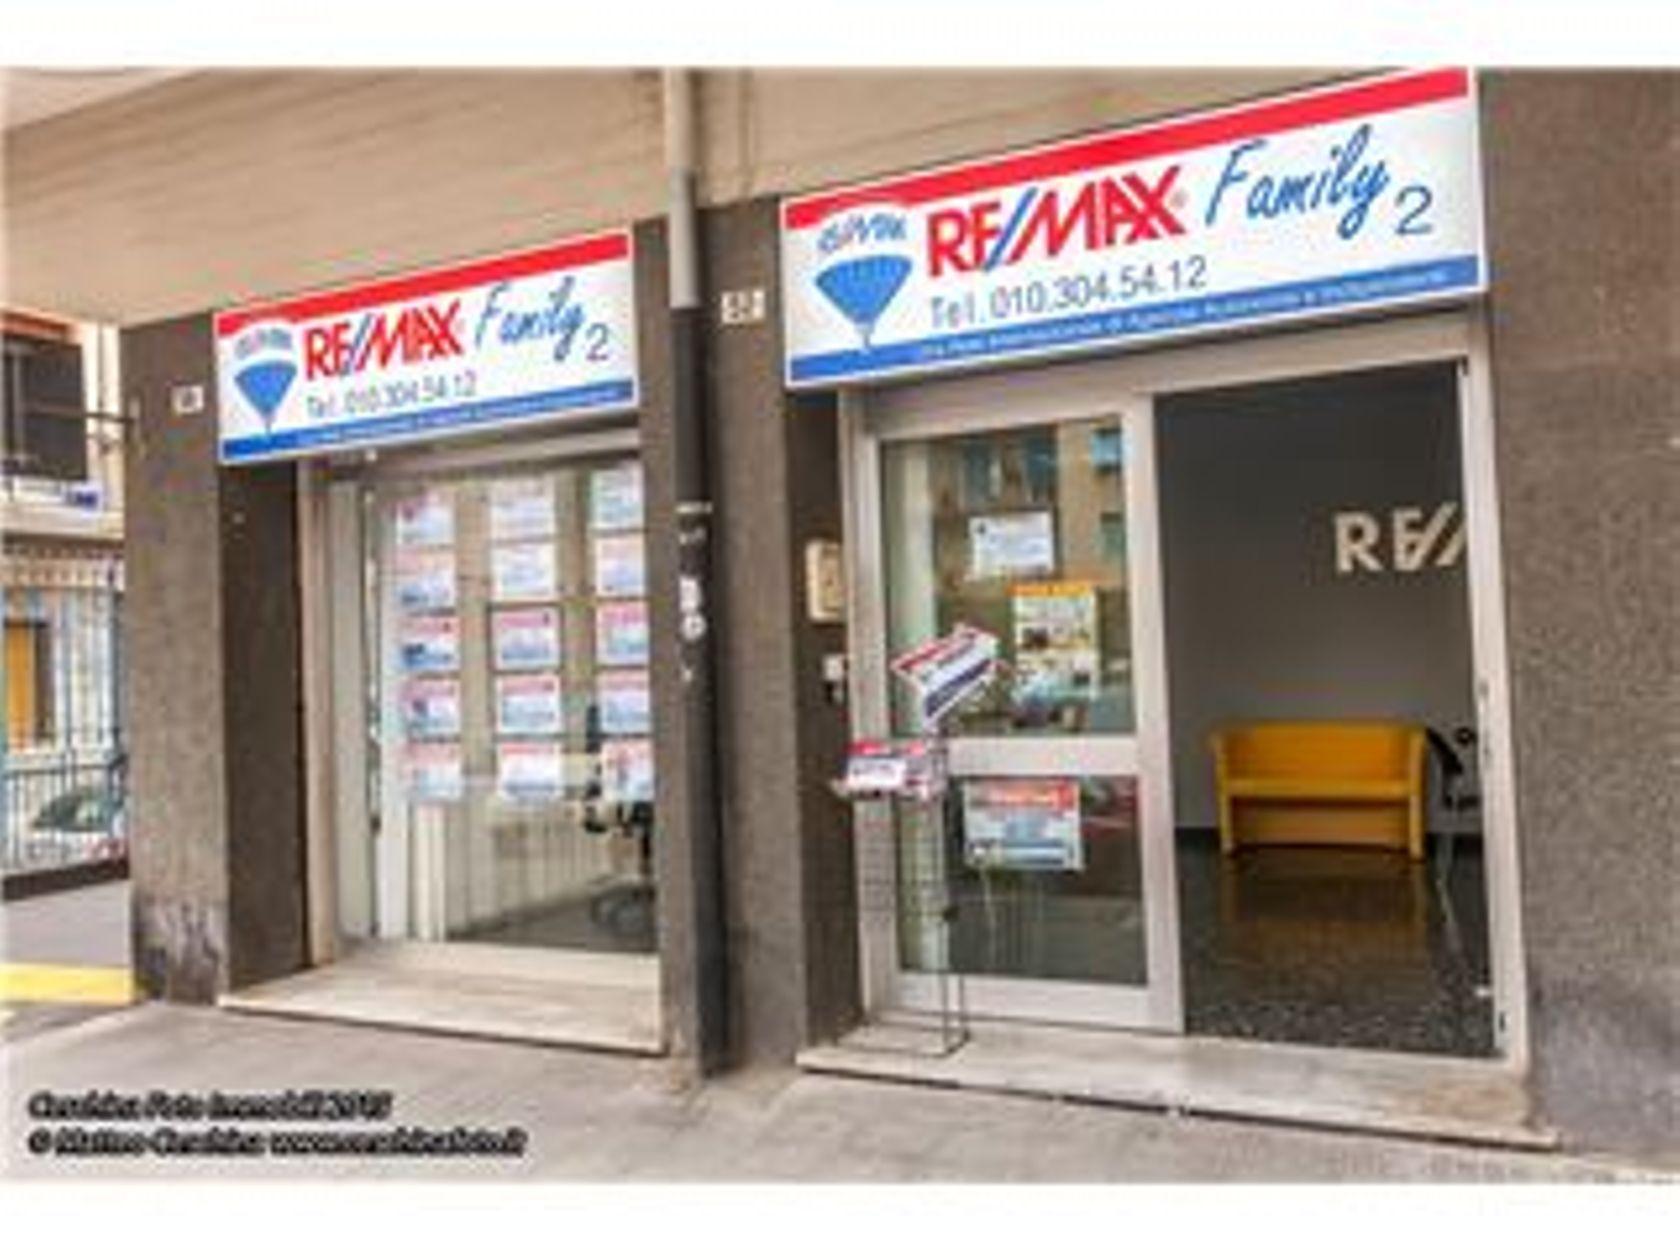 RE/MAX Family 2 Genova